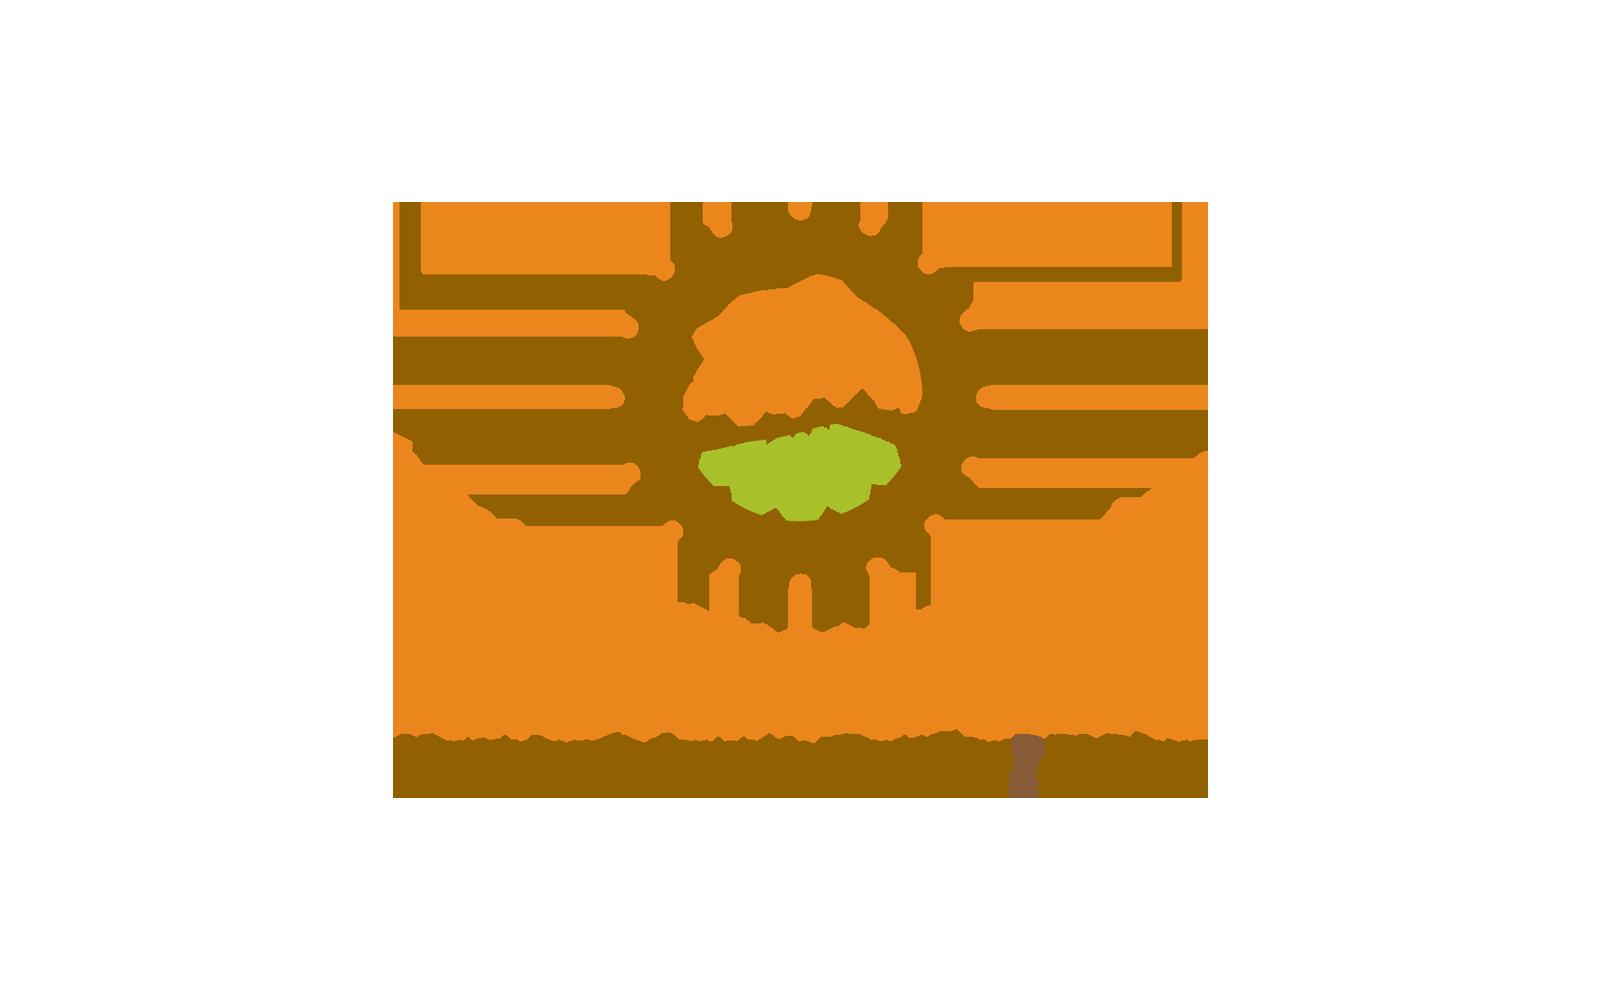 mnc_logo1